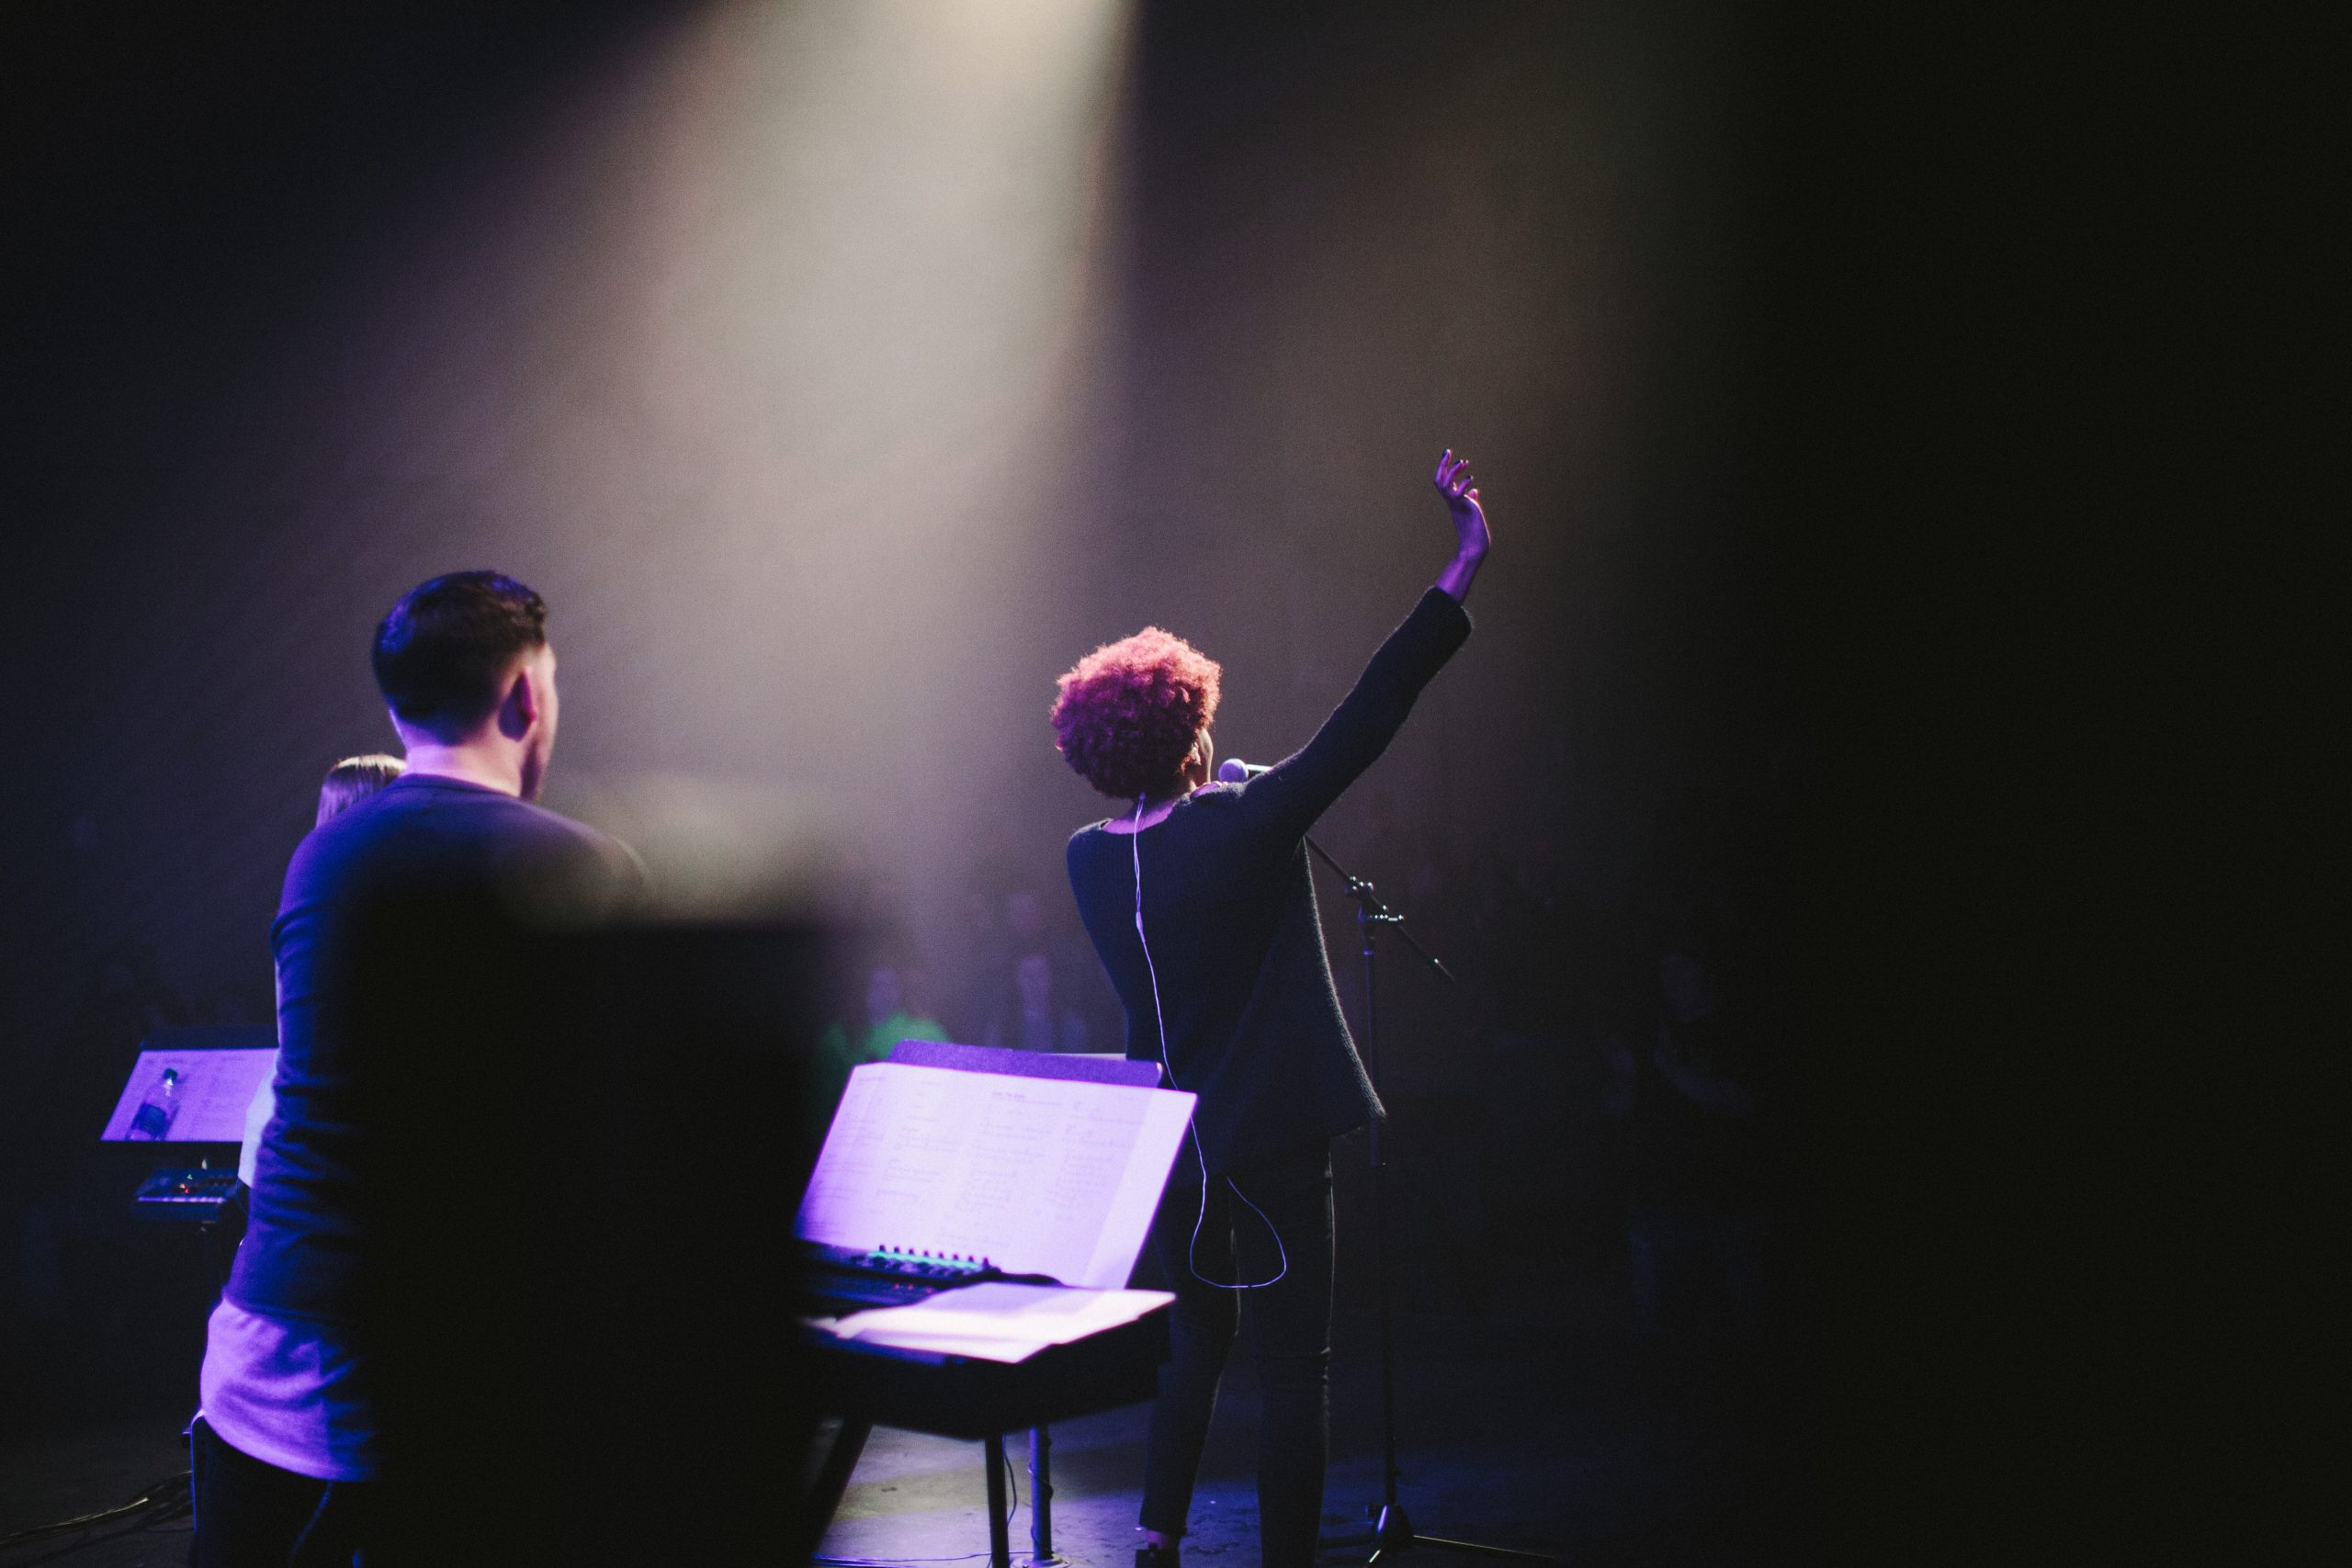 Female vocalist waving